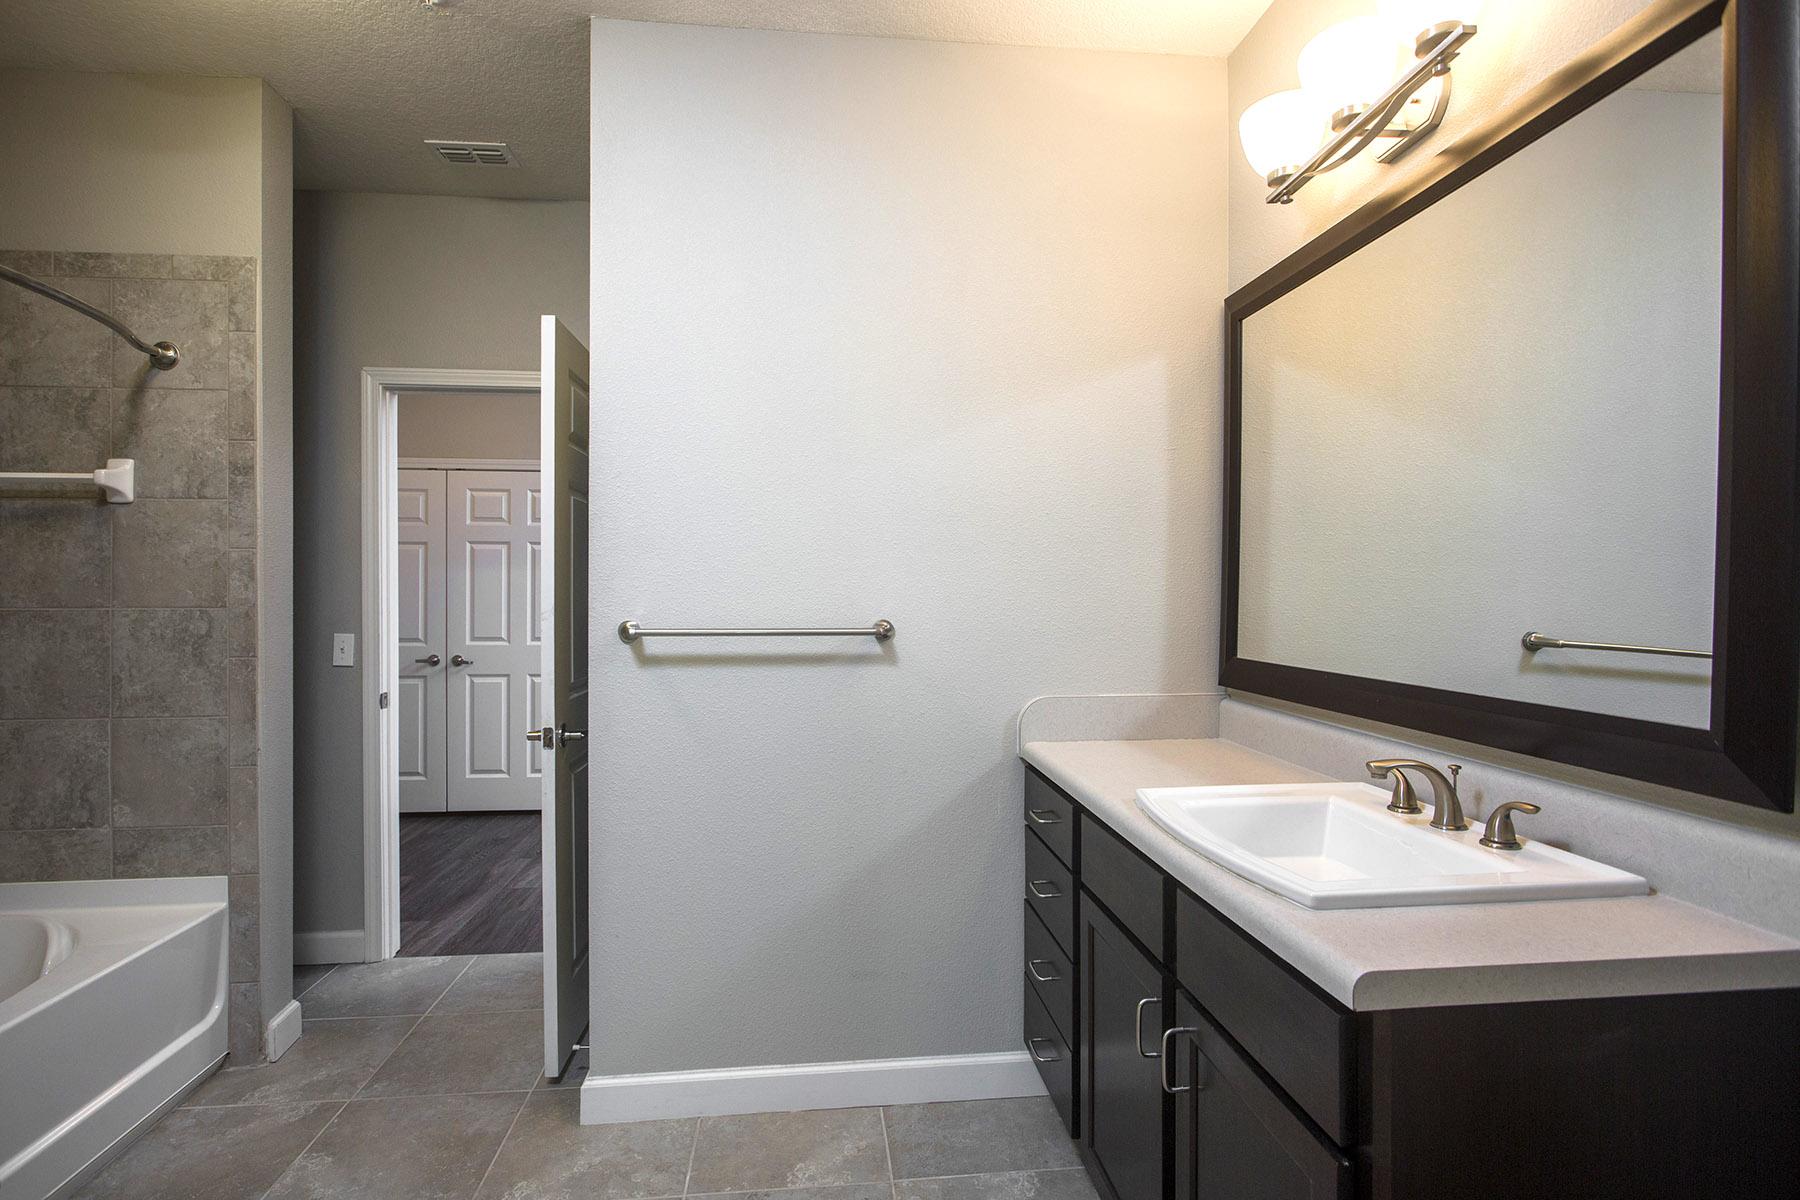 CharlestonEdge-Rental-Apartment-Brandon-Tampa-Florida-Pool-Bedrooms-Bathroom-1.jpg